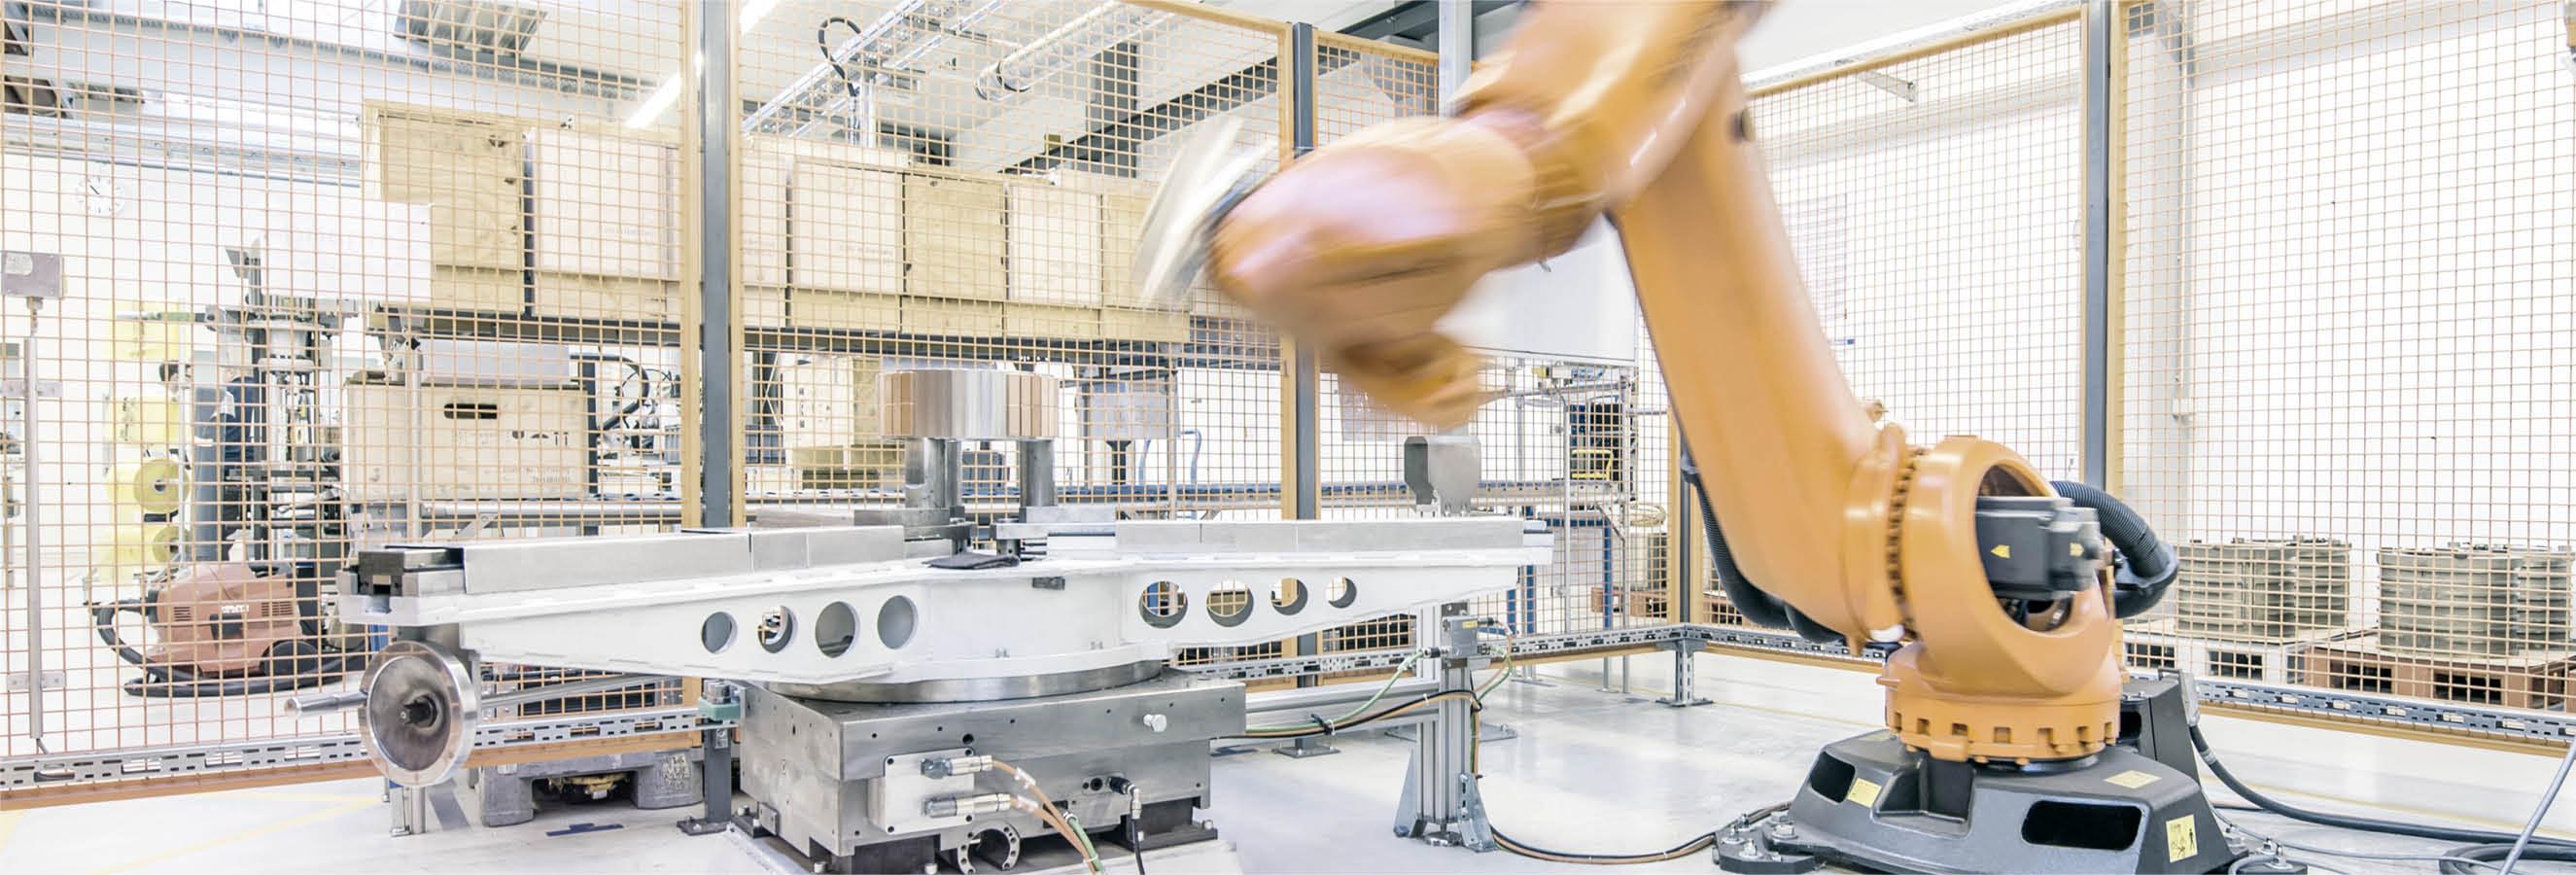 Kessler Automatic solenoid-rotor bonding